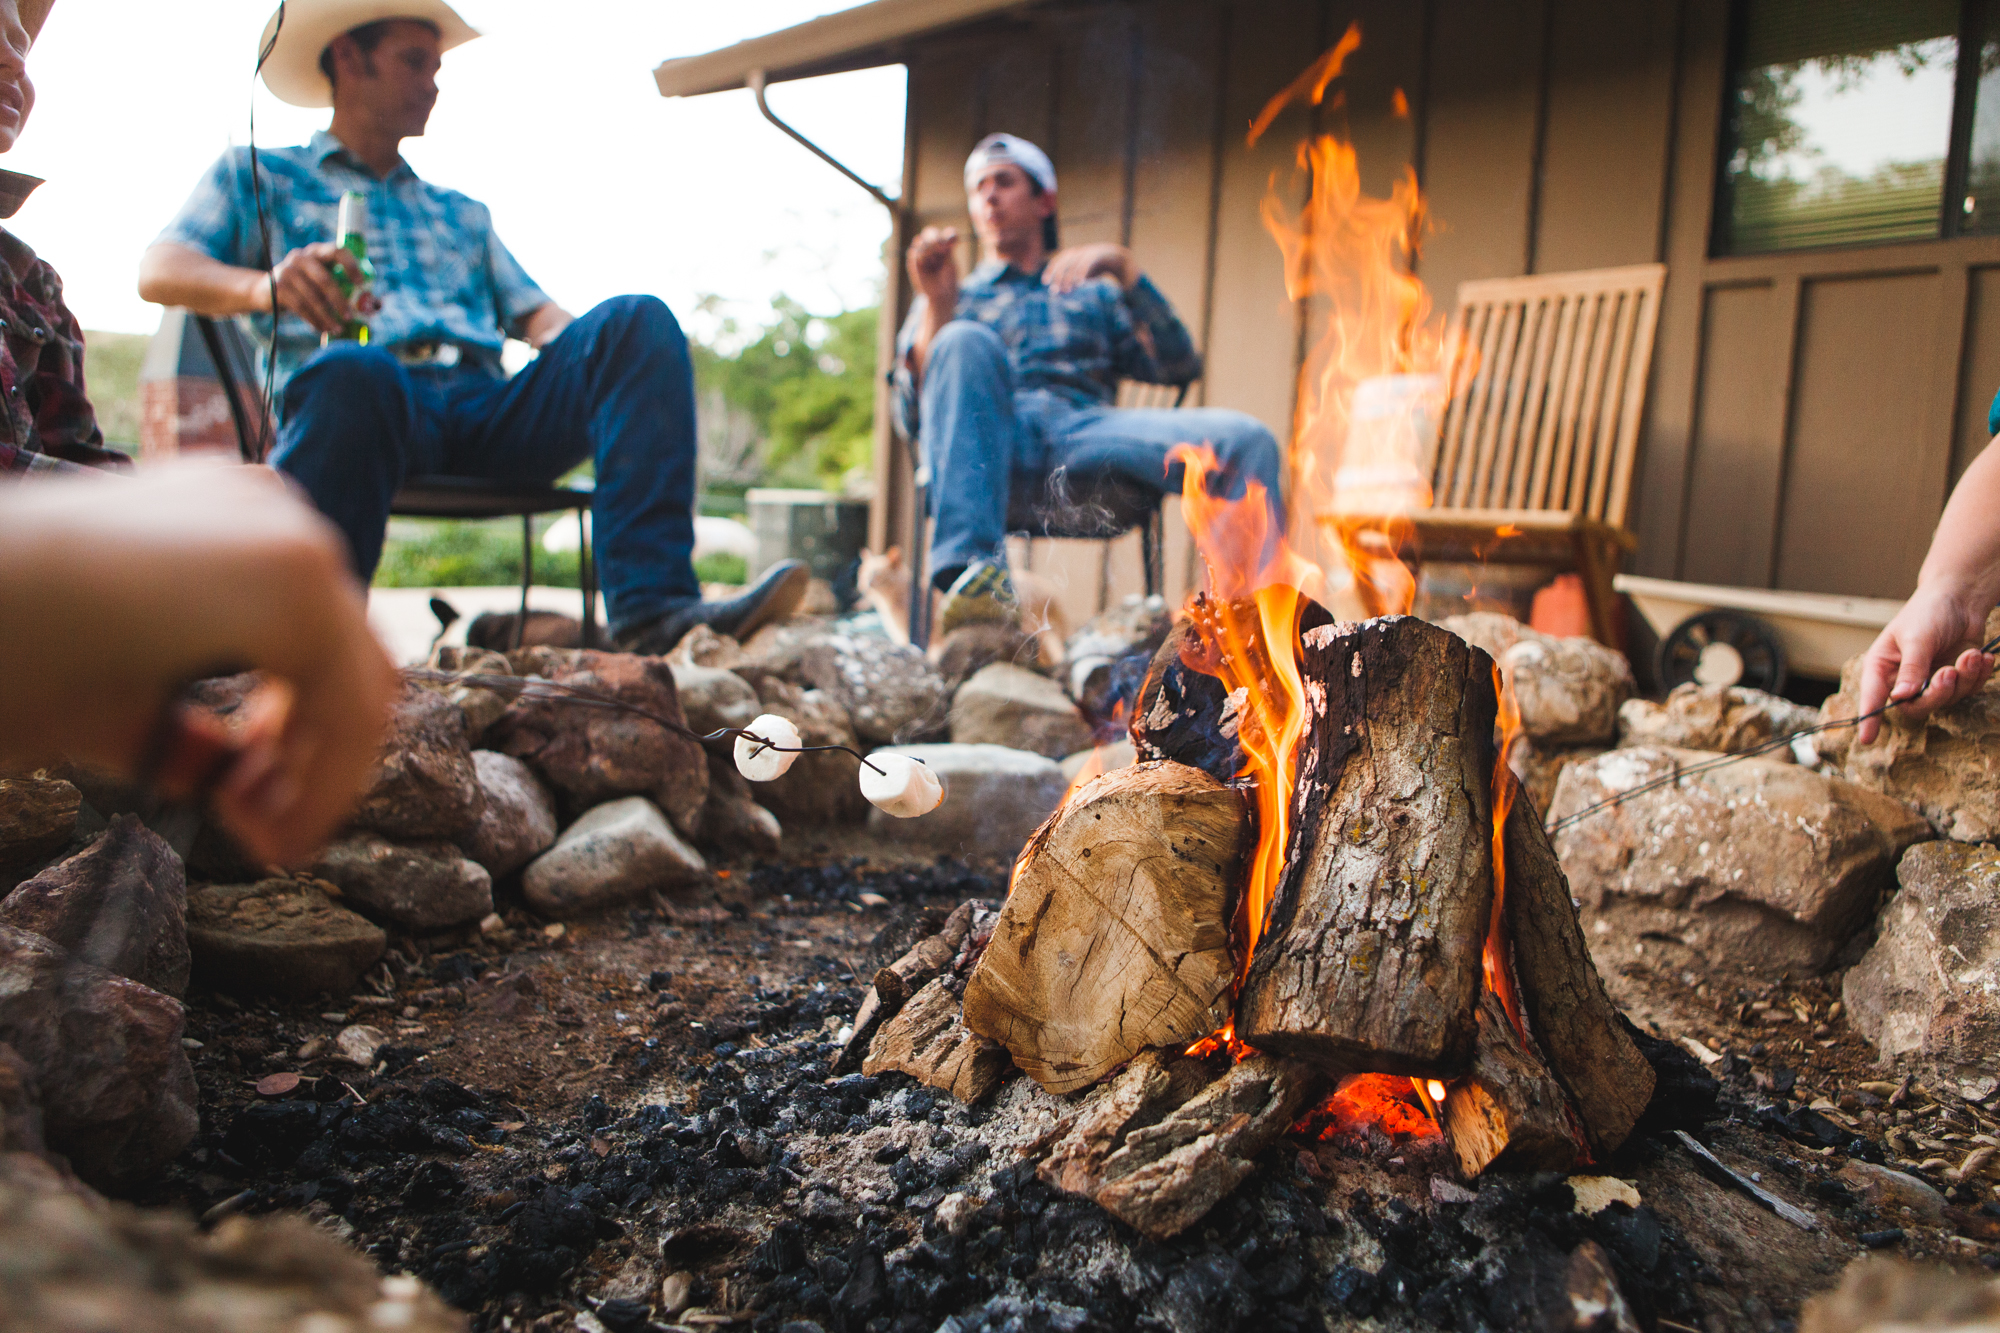 Nightly campfires